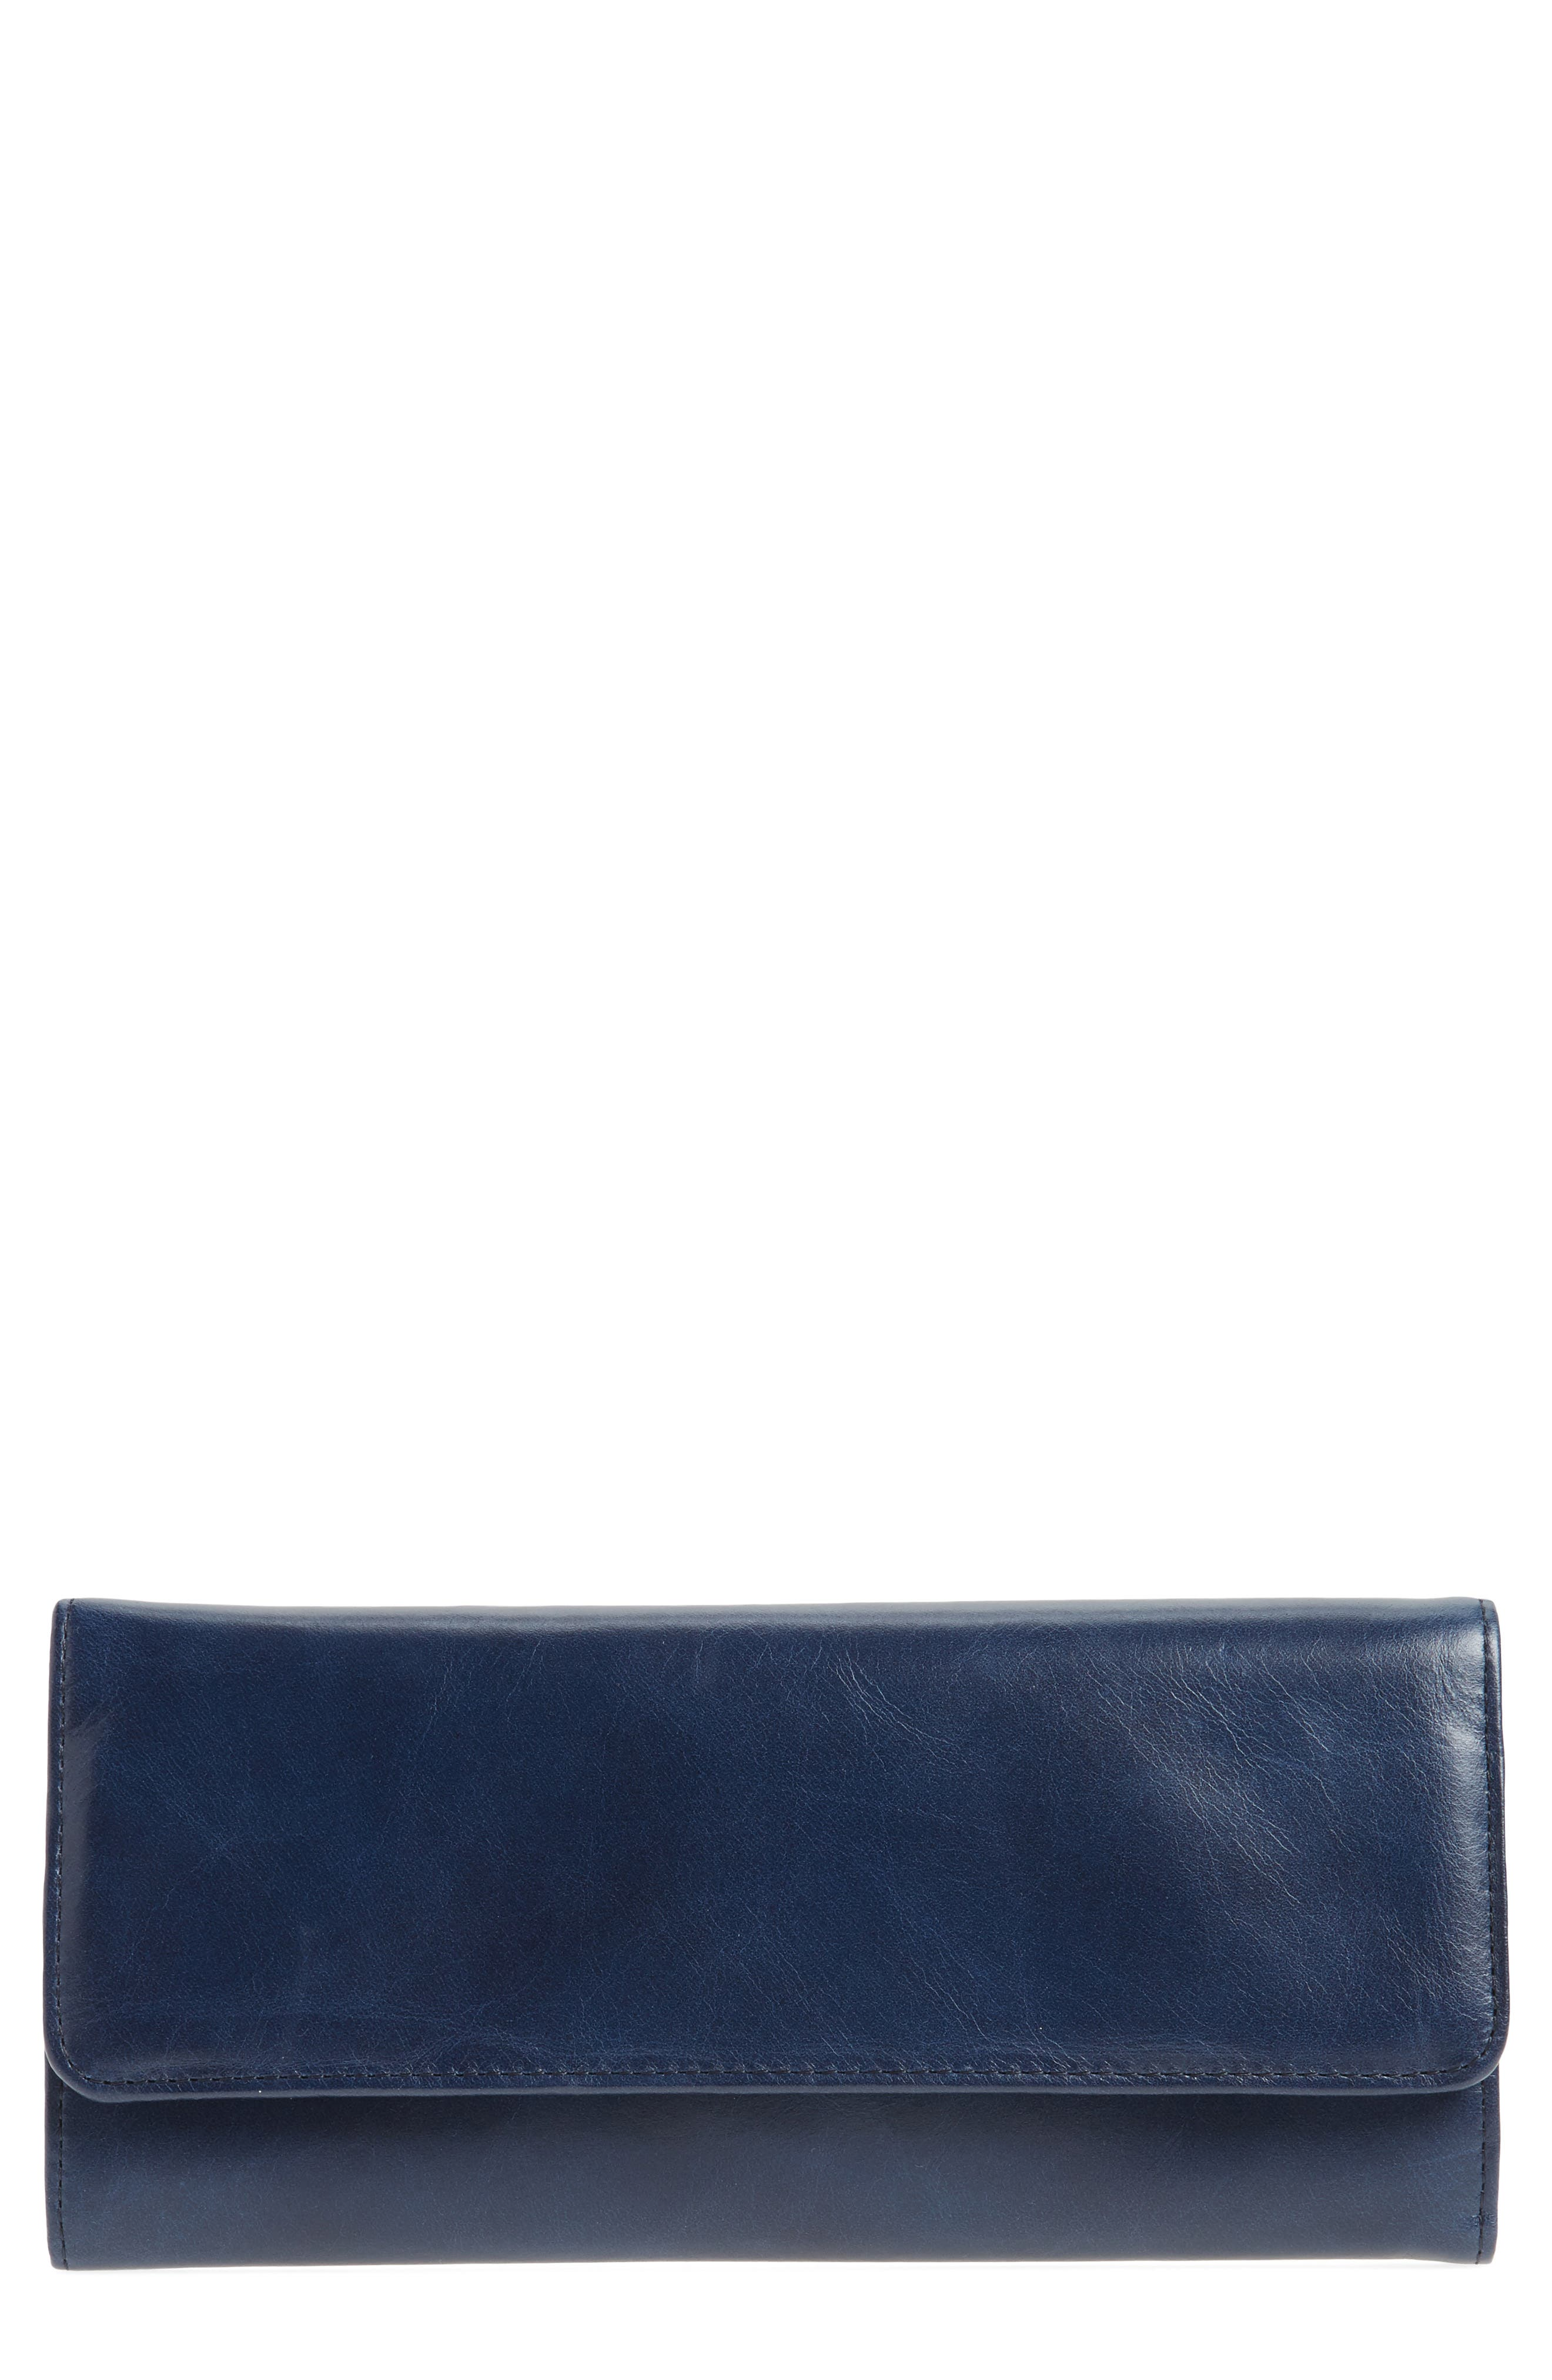 'Sadie' Leather Wallet,                             Main thumbnail 6, color,